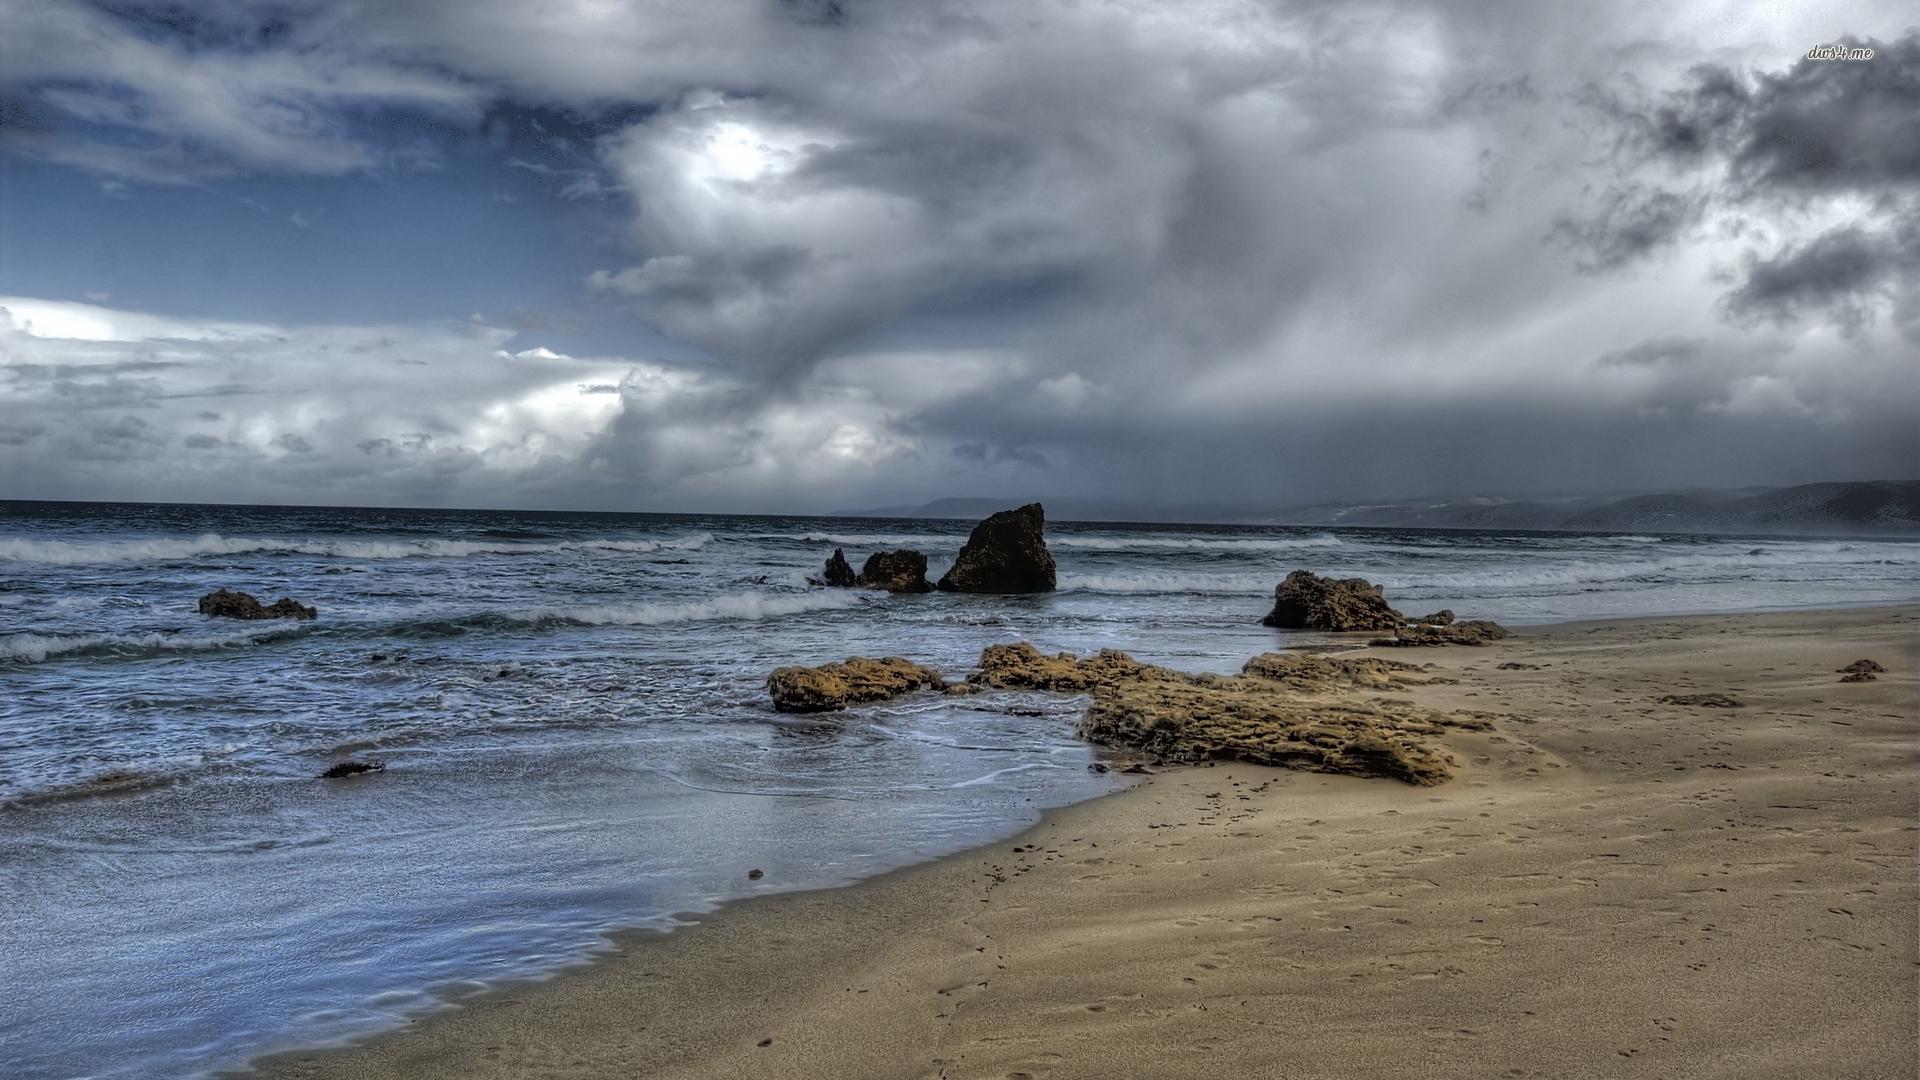 Storm clouds above the ocean wallpaper   1375779 1920x1080